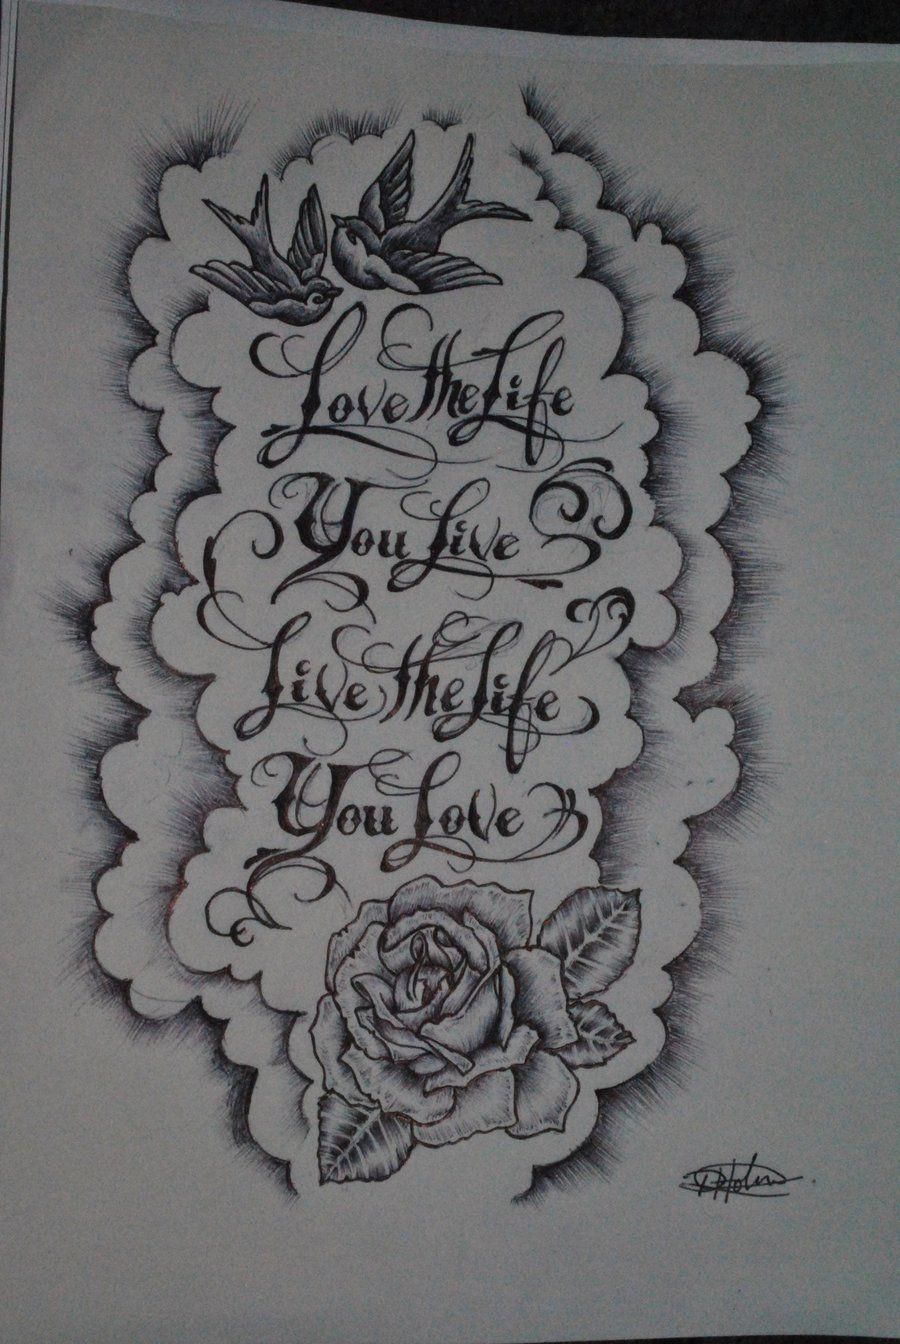 half sleeve tattoo designs drawings tattoo design 2012 2014 ryanmonsterholmes half sleeve. Black Bedroom Furniture Sets. Home Design Ideas